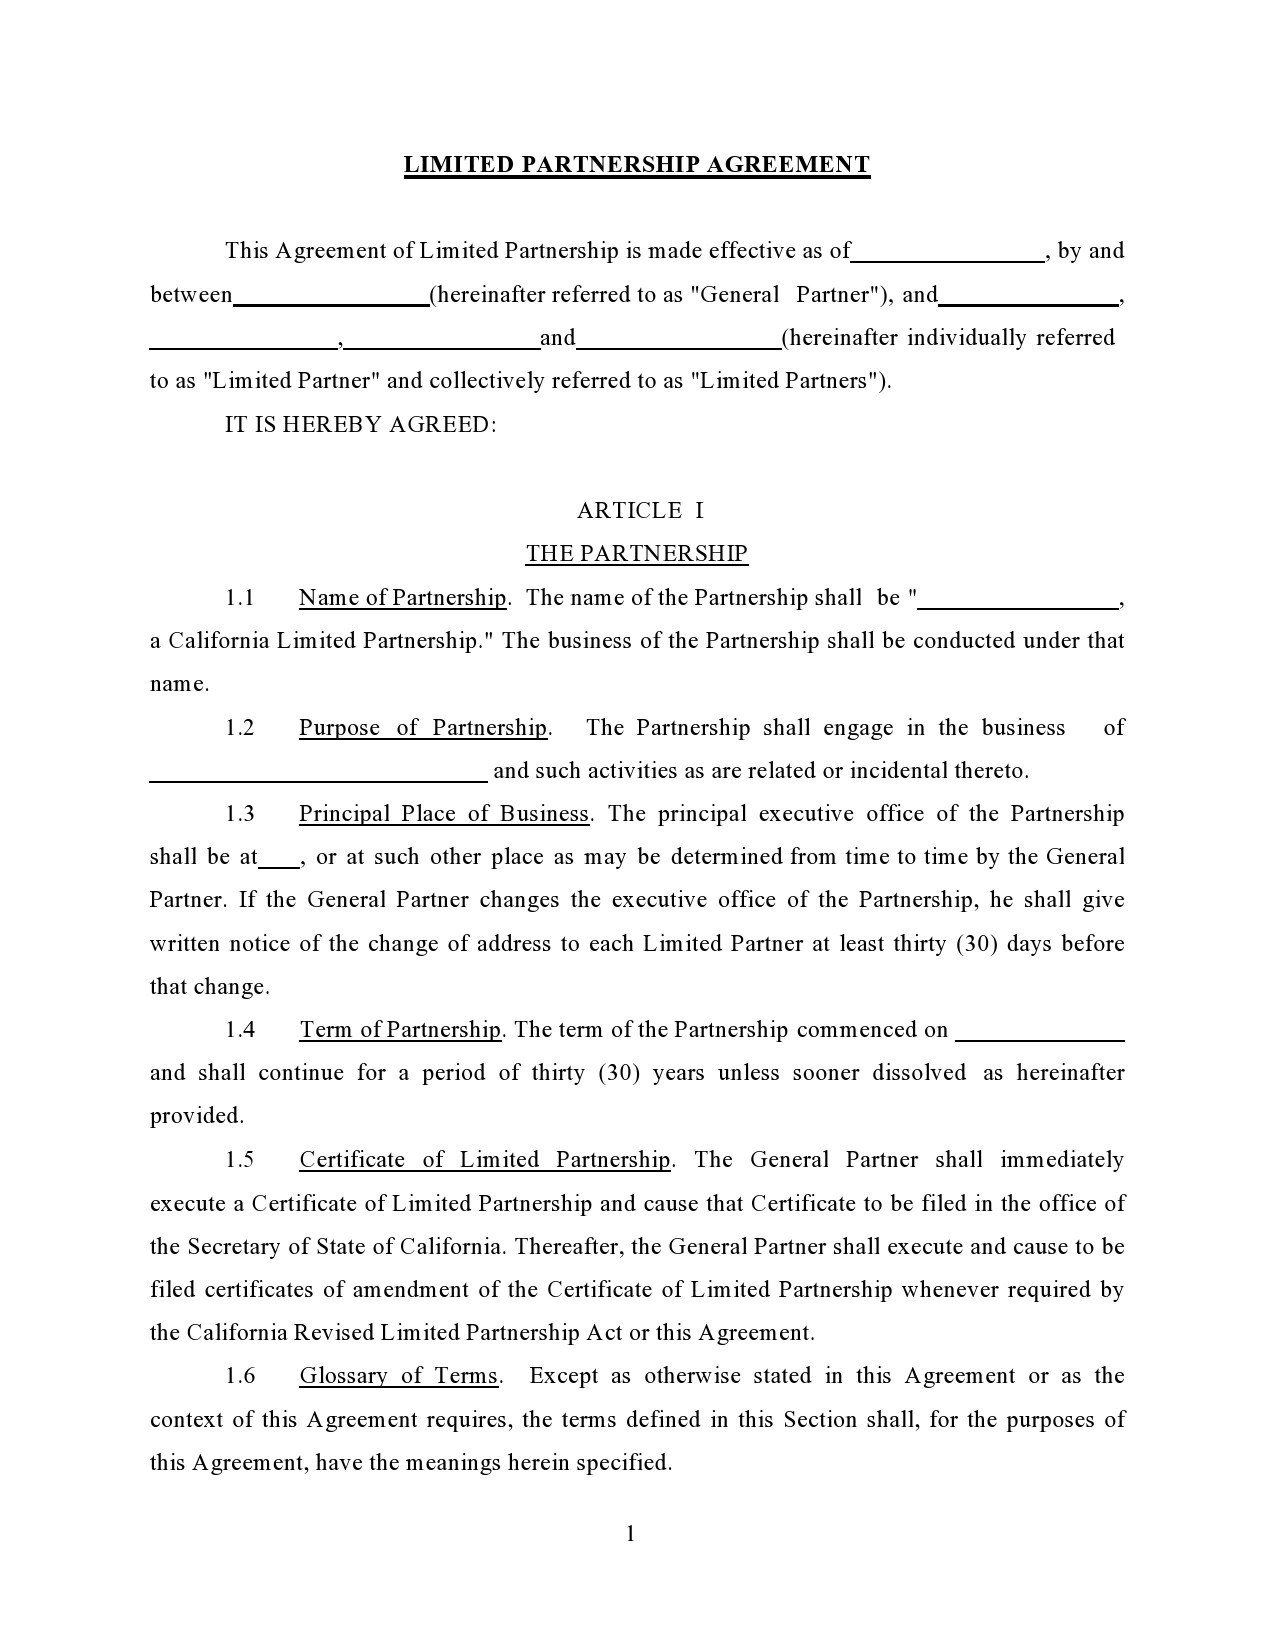 Free limited partnership agreement 01